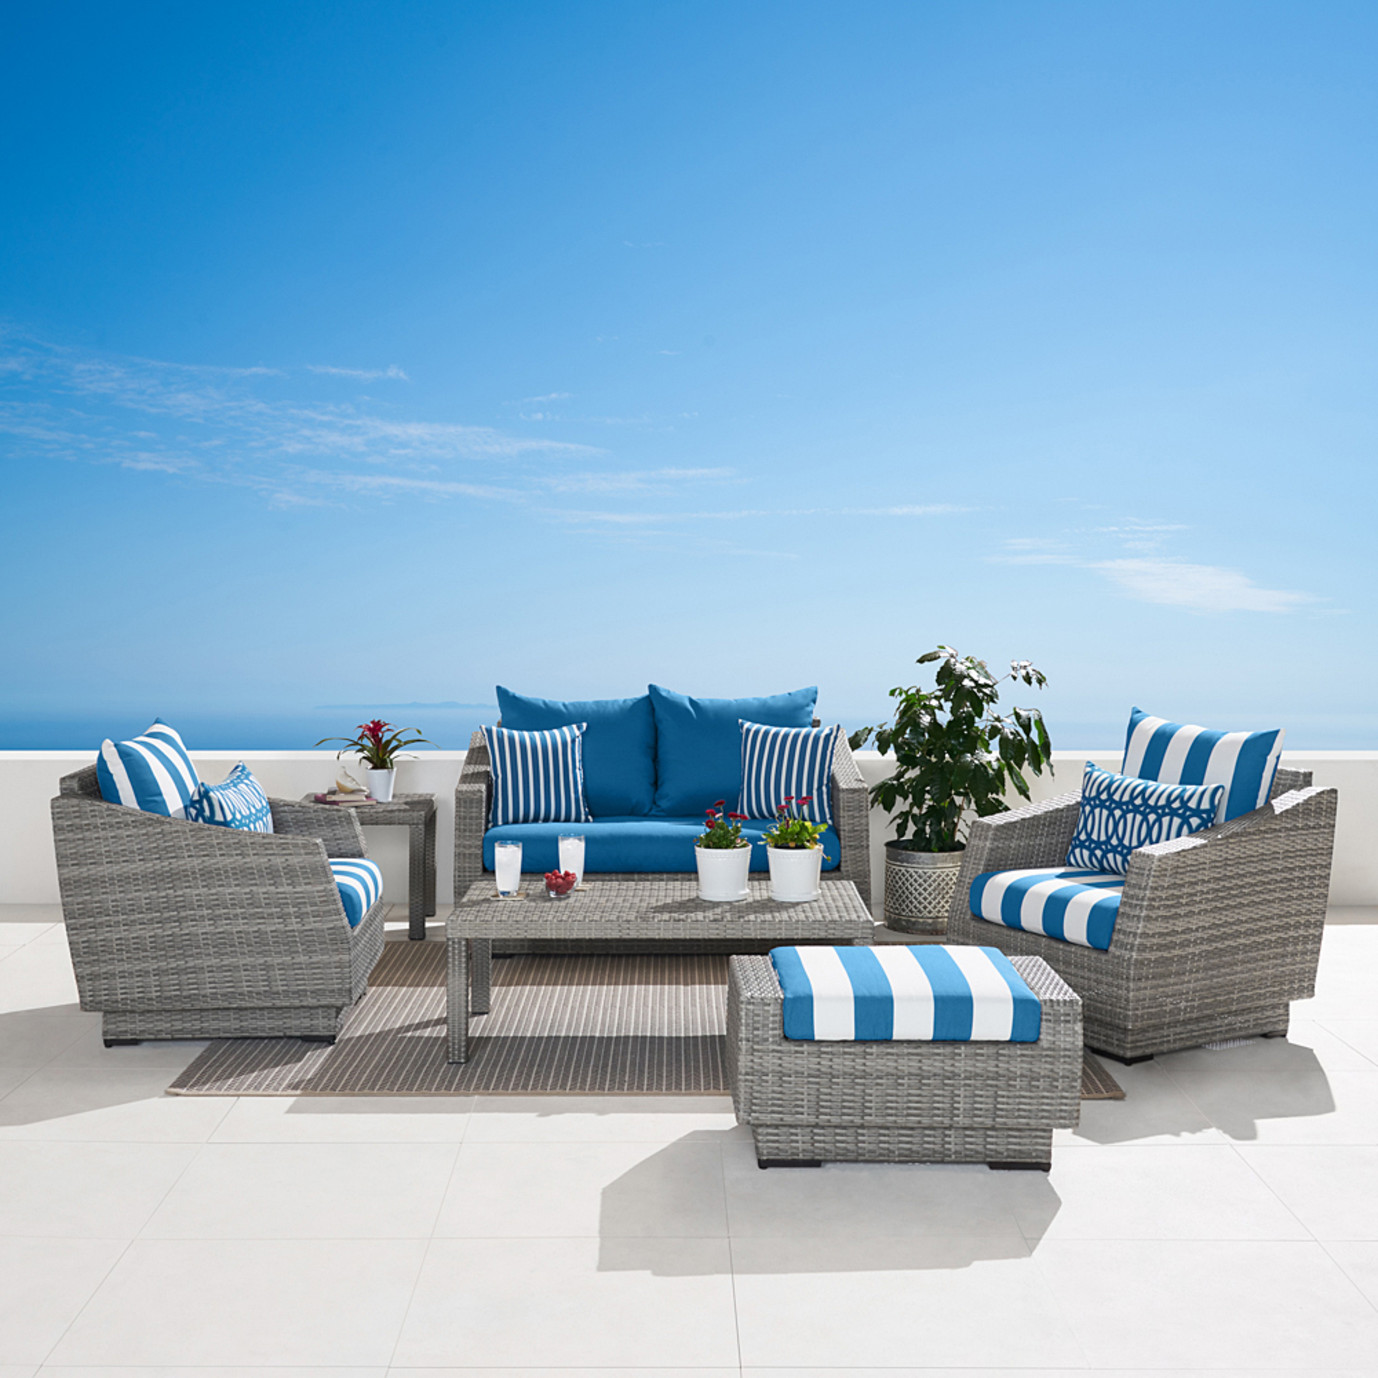 Cannes™ 6pc Love and Club Seating Set - Regatta Blue